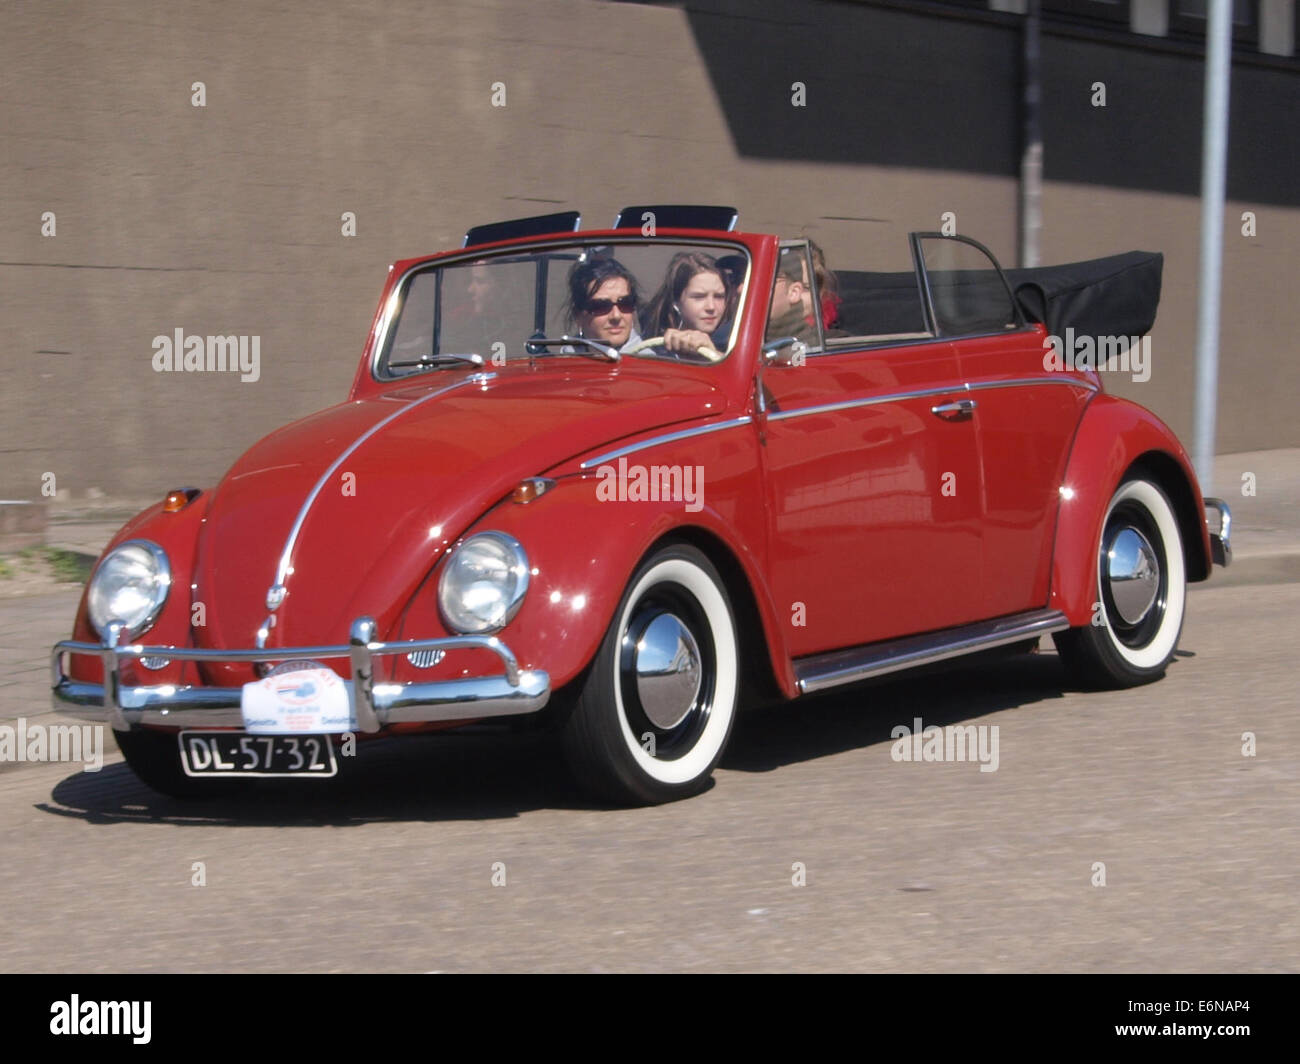 1960 Red Volkswagen Kever cabrio, licenceno DL-57-32, pic1 Stock Photo